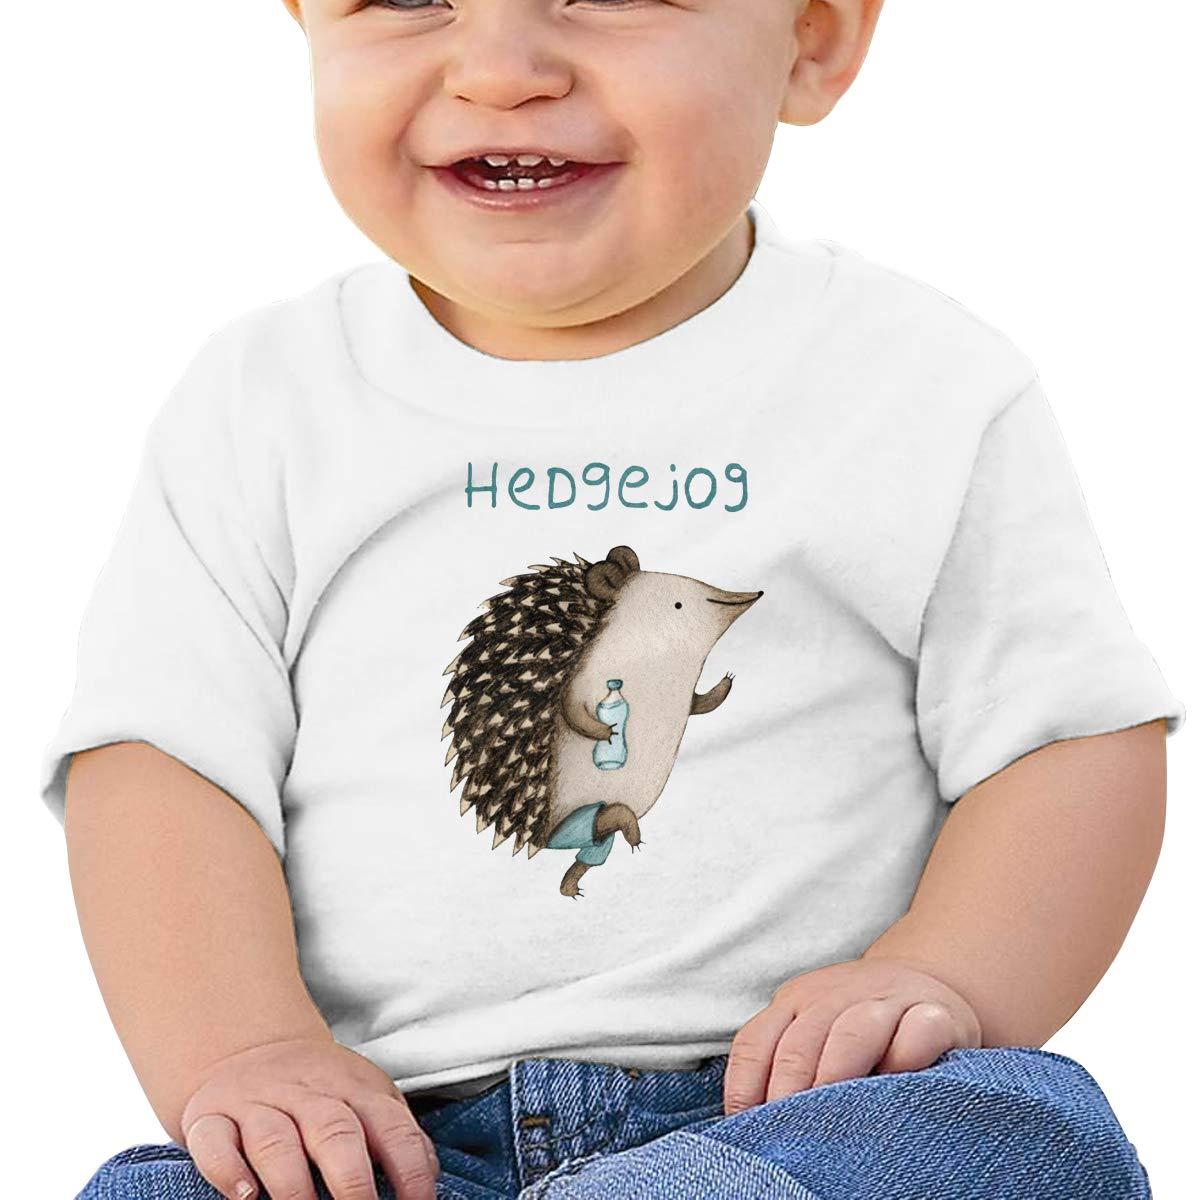 SakanpoHedgehog Toddler//Infant Short Sleeve Cotton T Shirts White